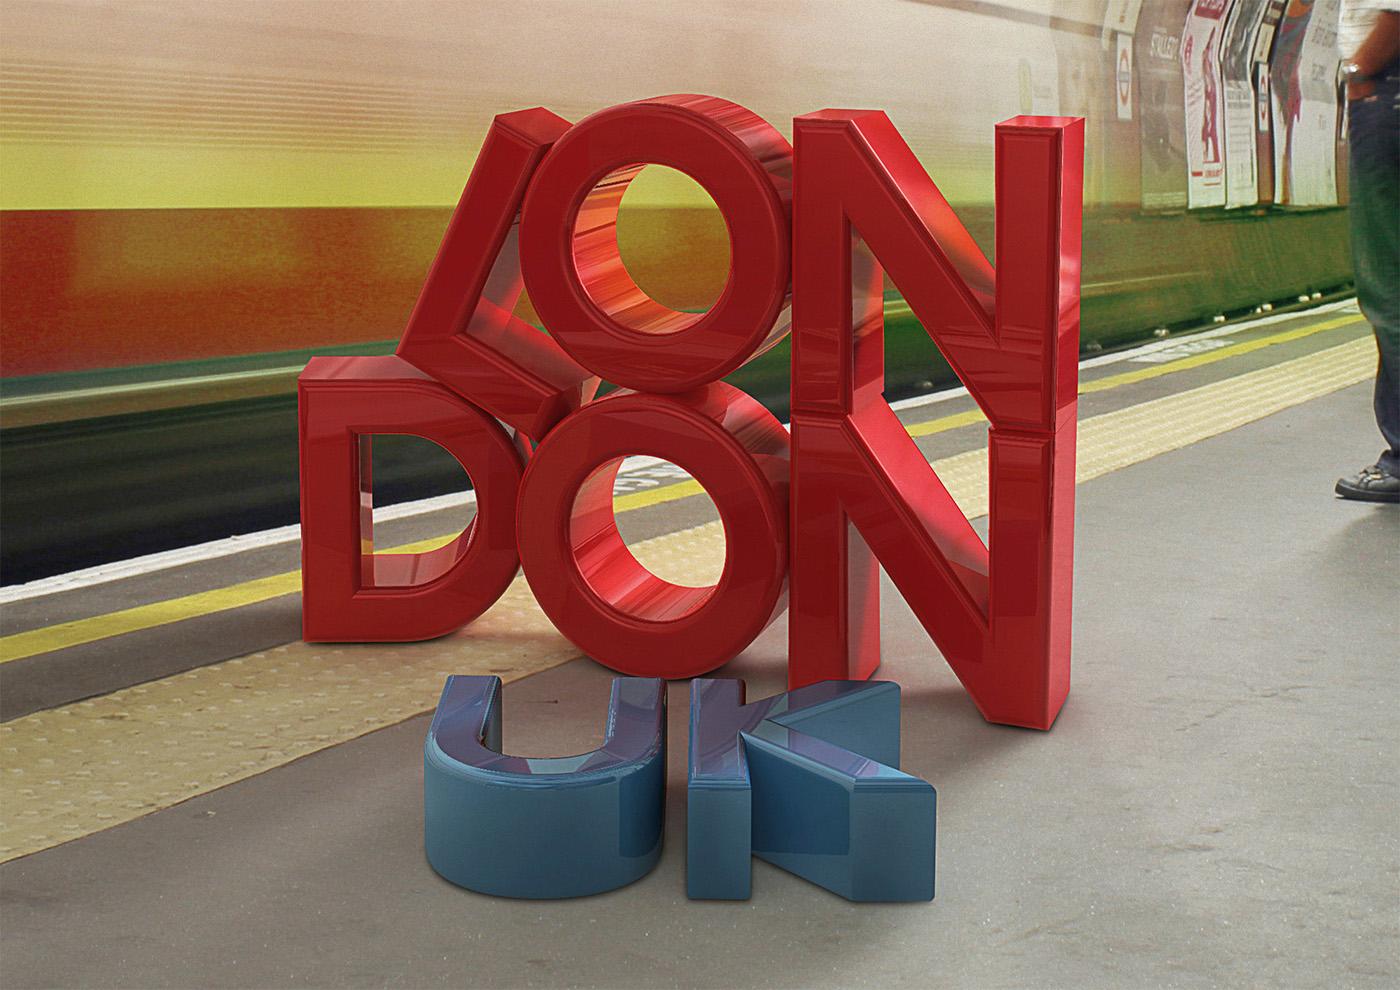 Adobe Portfolio 3D type compositing photoshop cinema 4d concrete textures Melbourne London  new zealand India  bolivia photo Australia